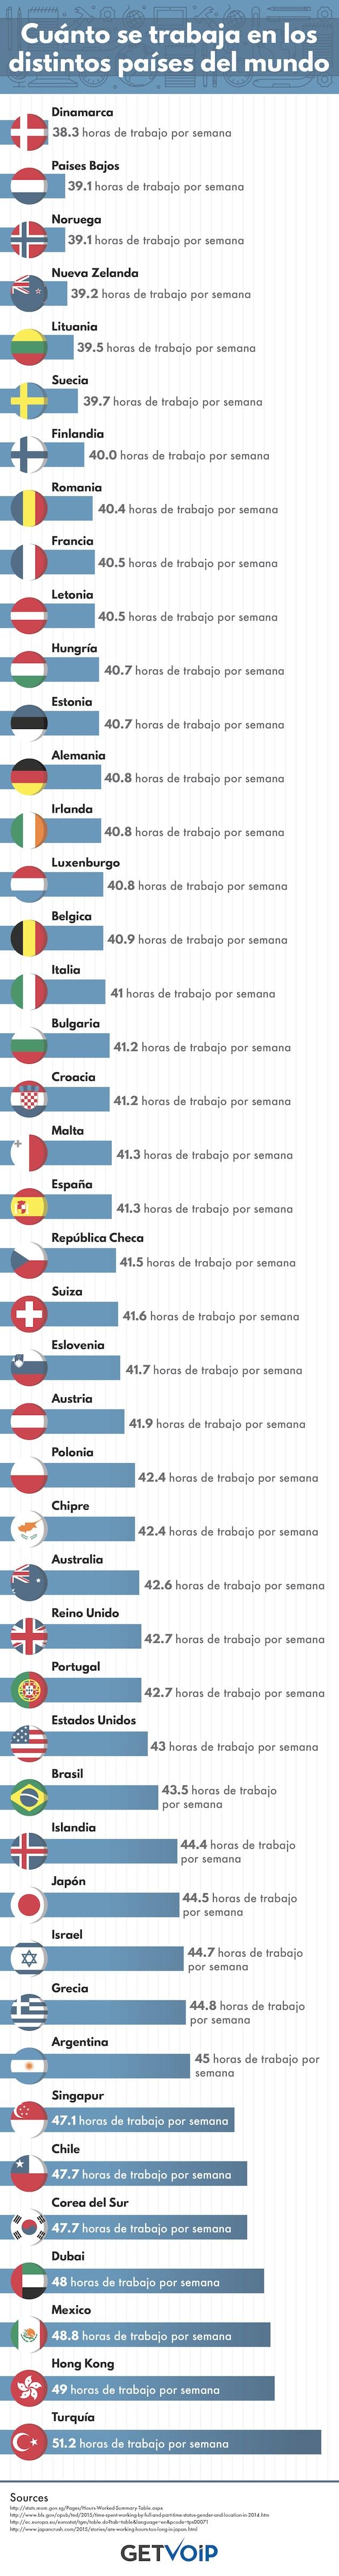 Cuánto se trabaja en cada país